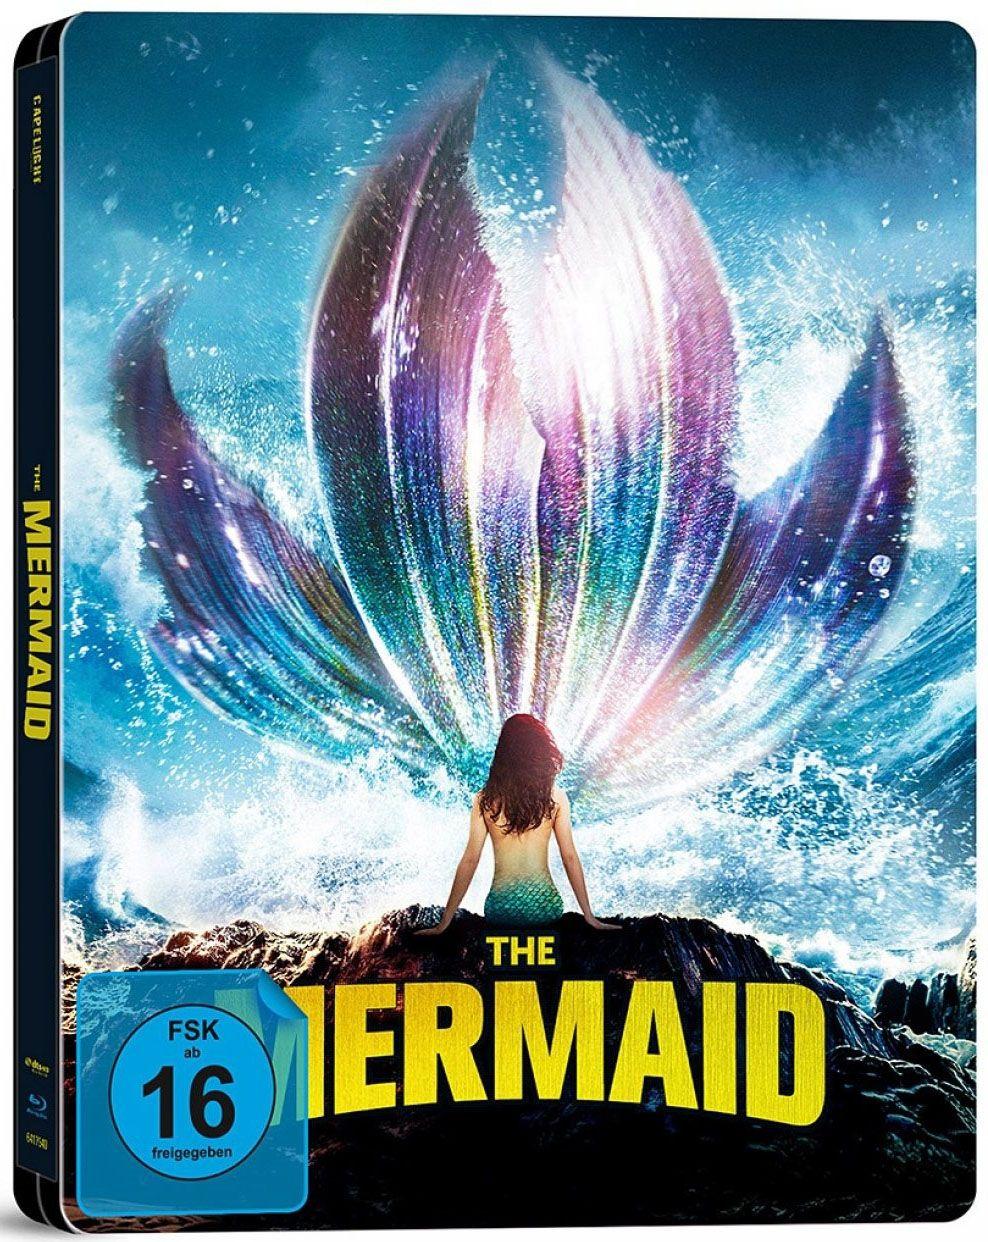 Mermaid, The (Lim. Steelbook) (2 Discs) (BLURAY 3D + BLURAY)